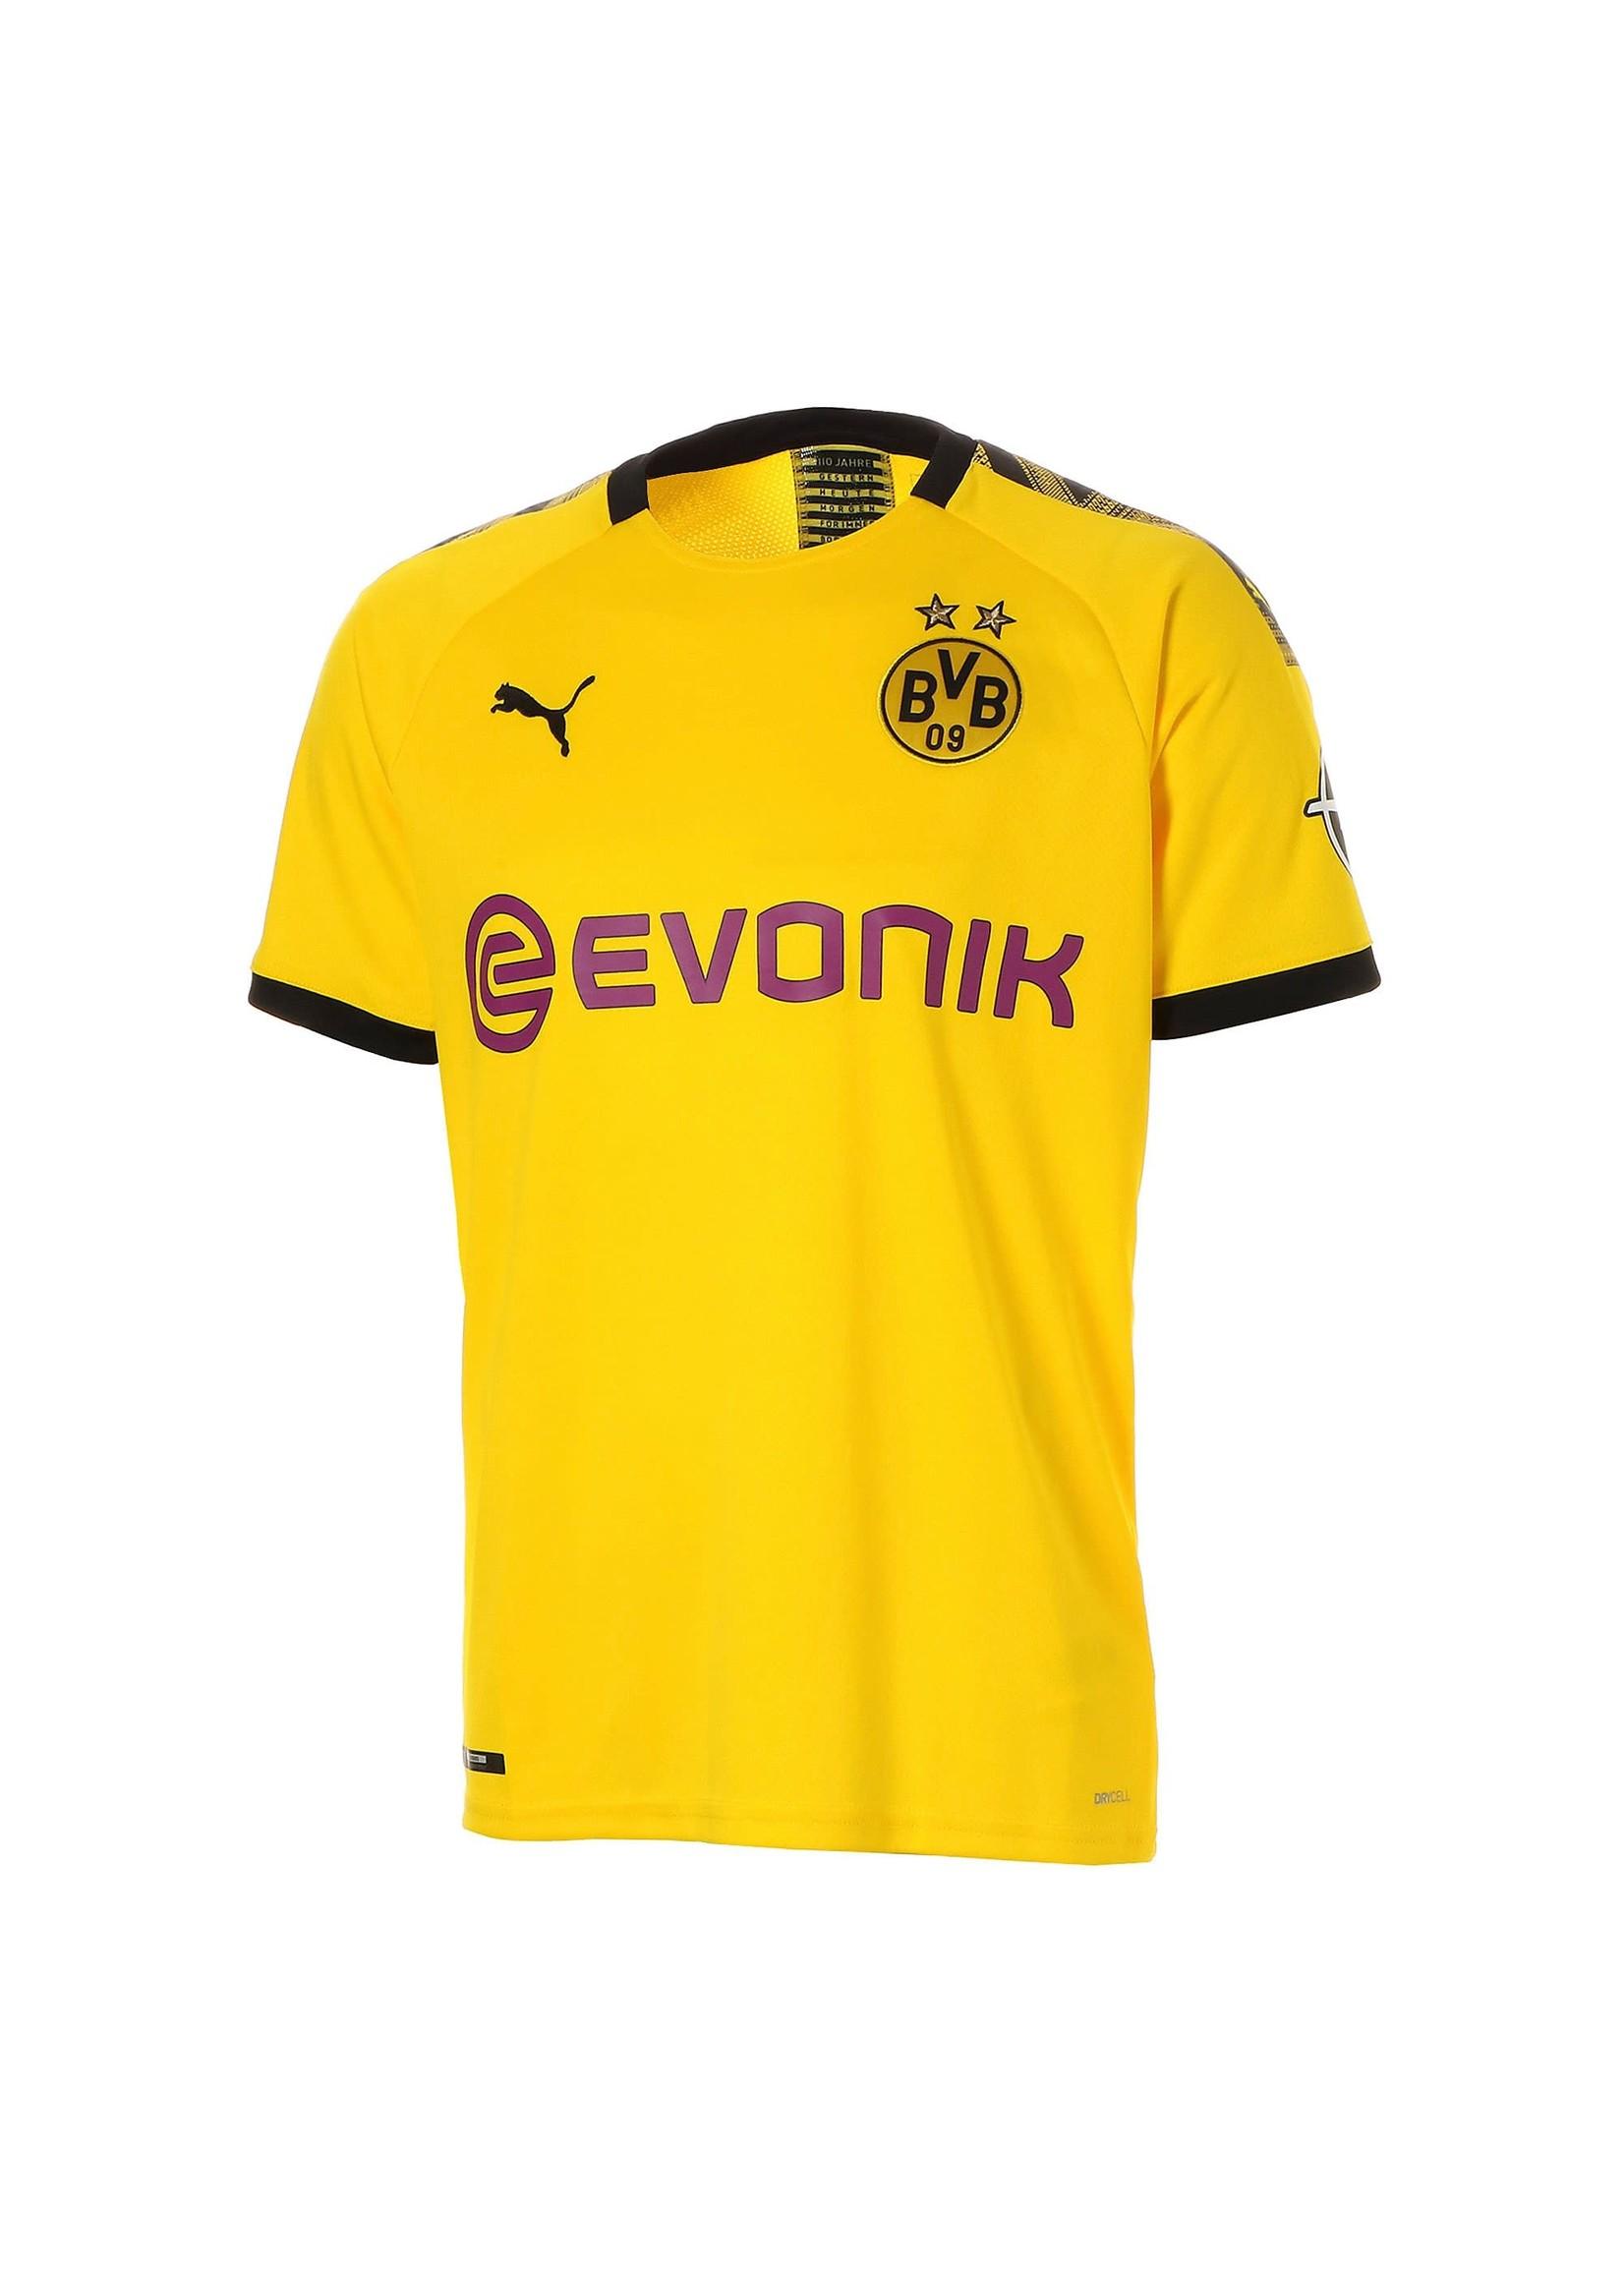 Puma Borussia Dortmund 19/20 Home Jersey Adult Small